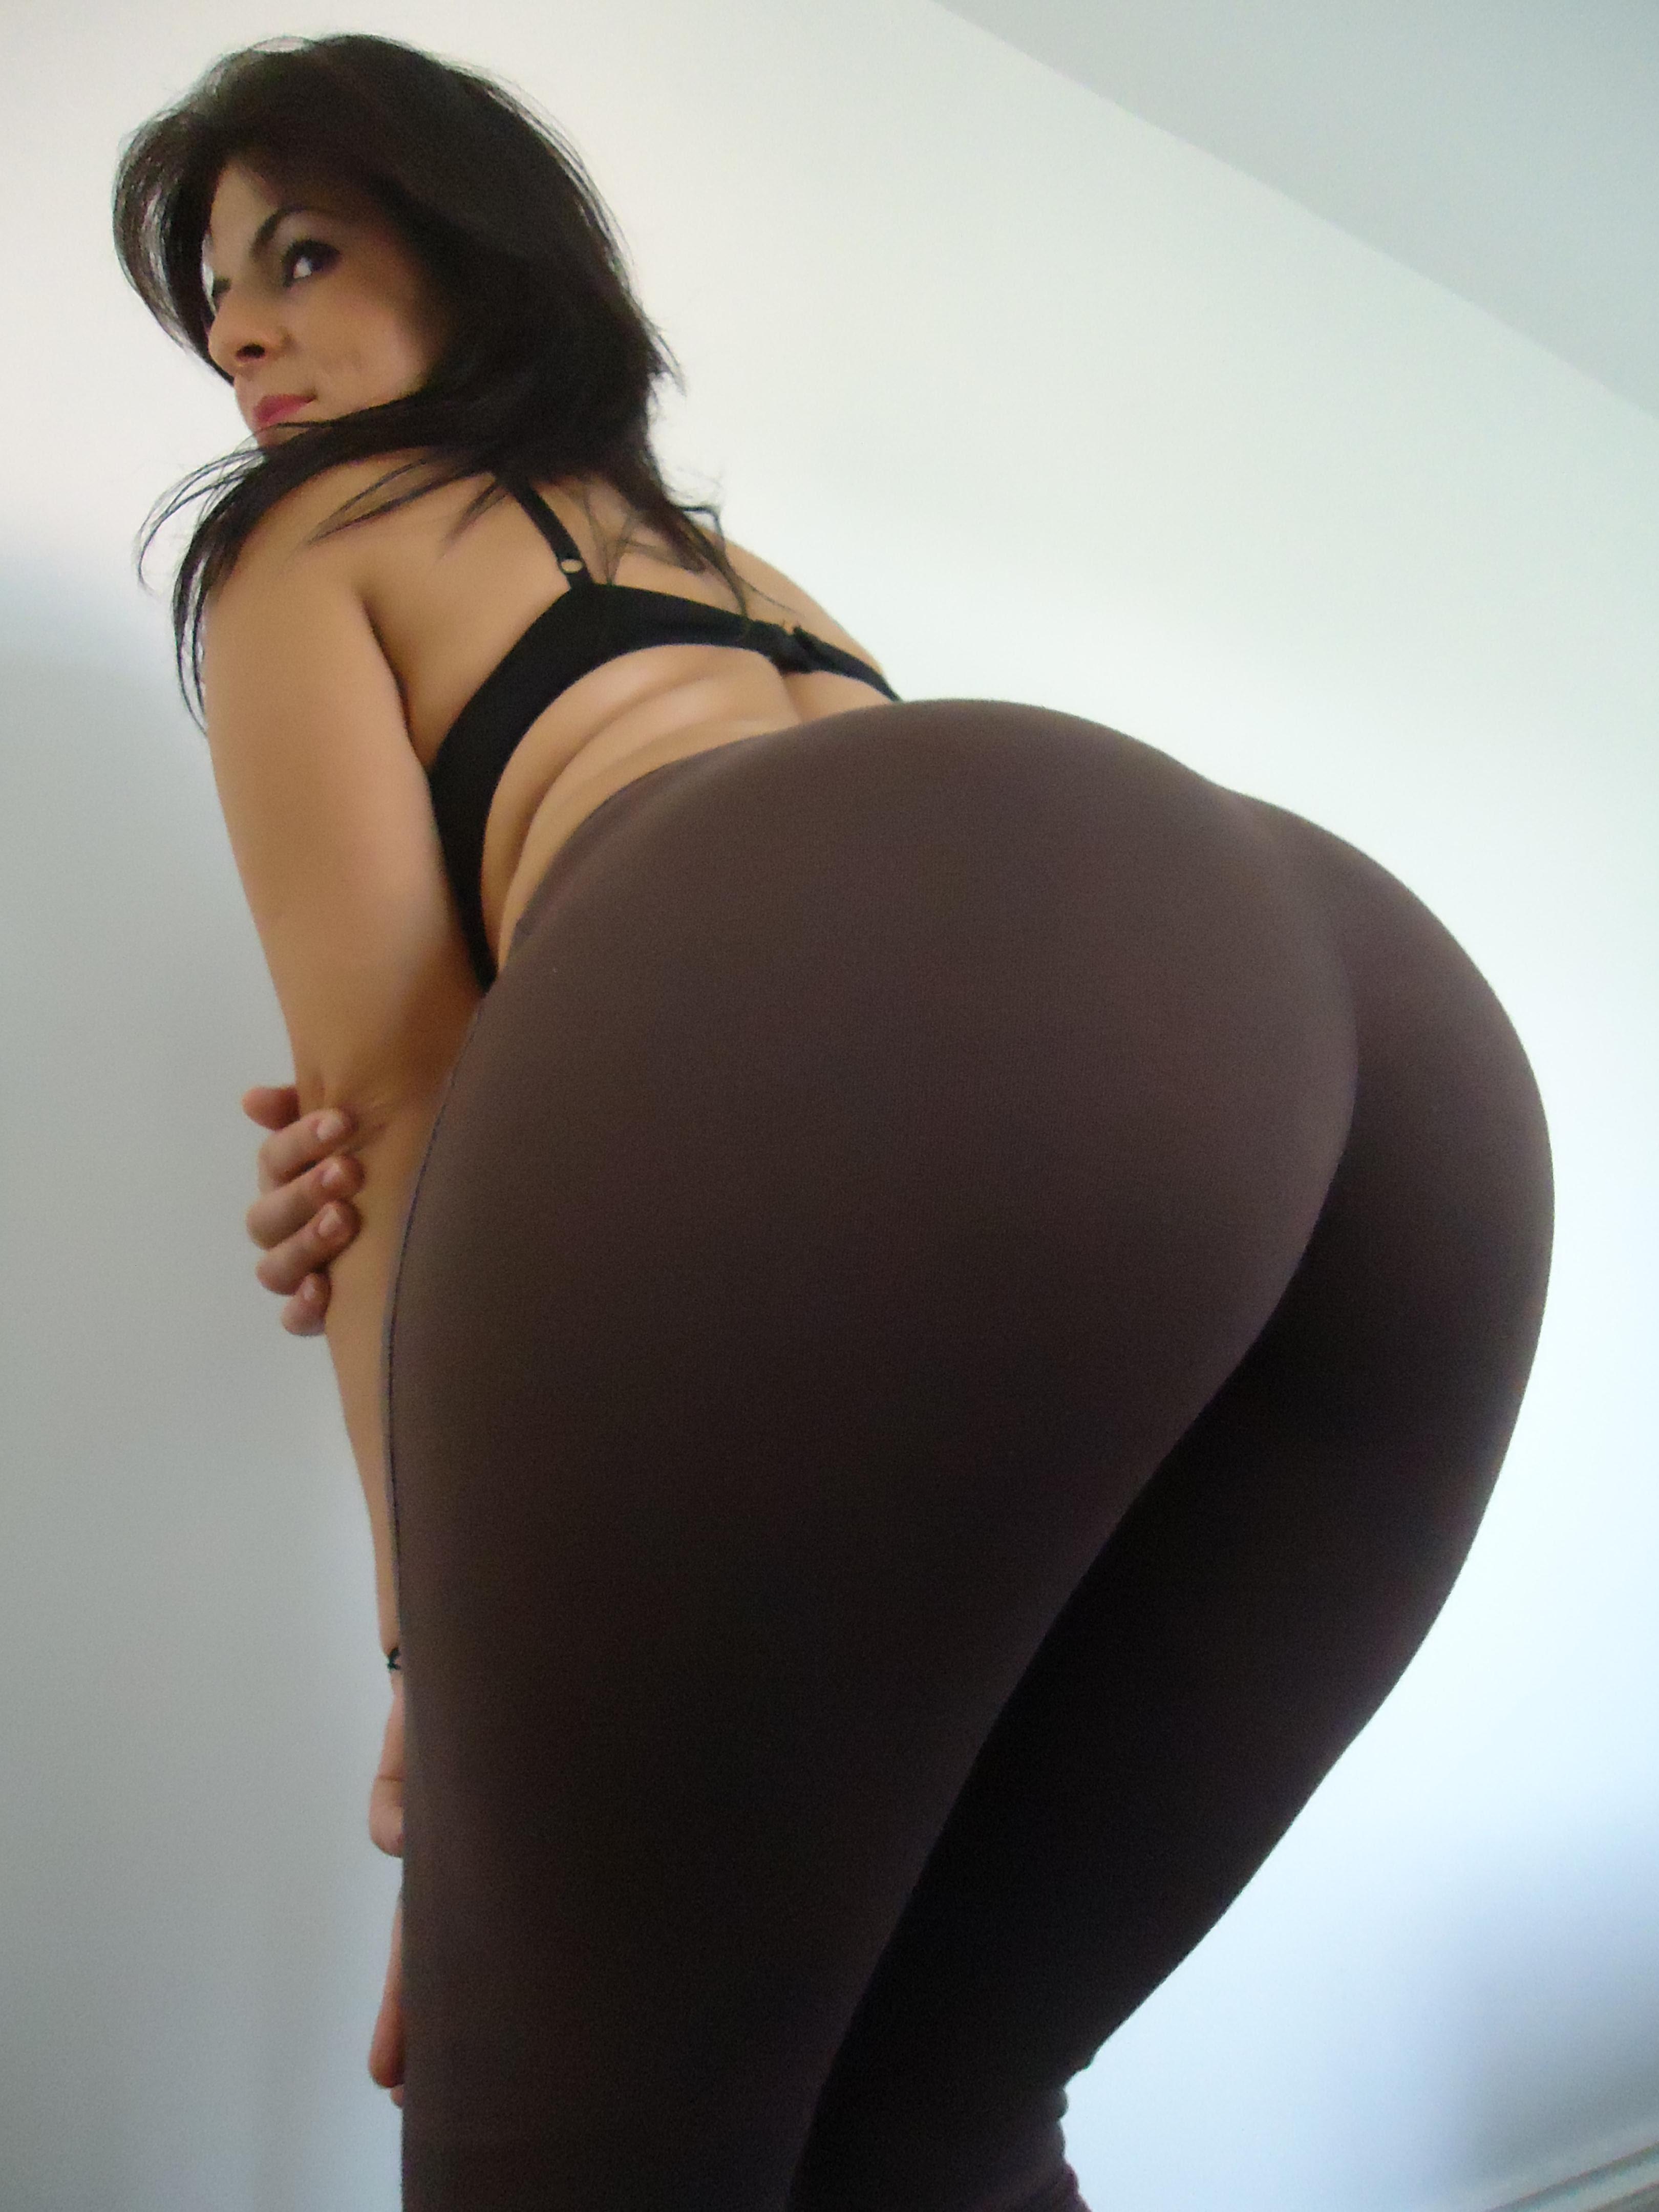 Big Ass Twerking Naked Solo